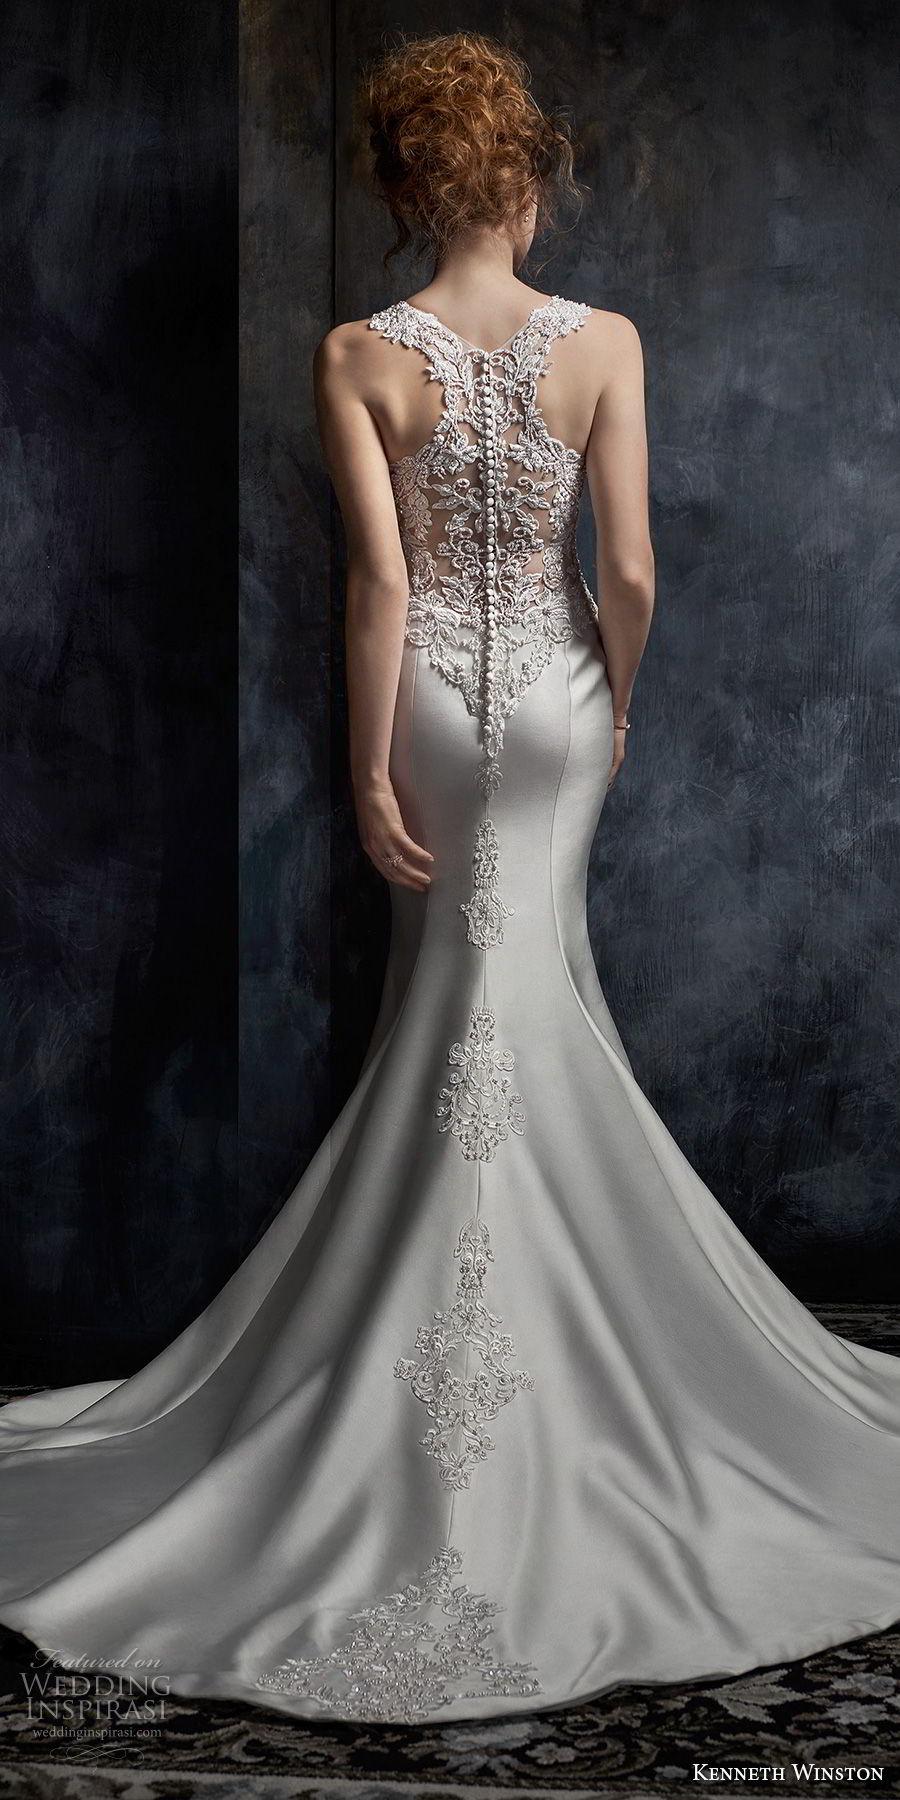 kenneth winston fall 2017 bridal sleeveless embroidered strap v neck heavily embellished bodice satin skirt elegant sheath wedding dress rasor back medium train (41) bv